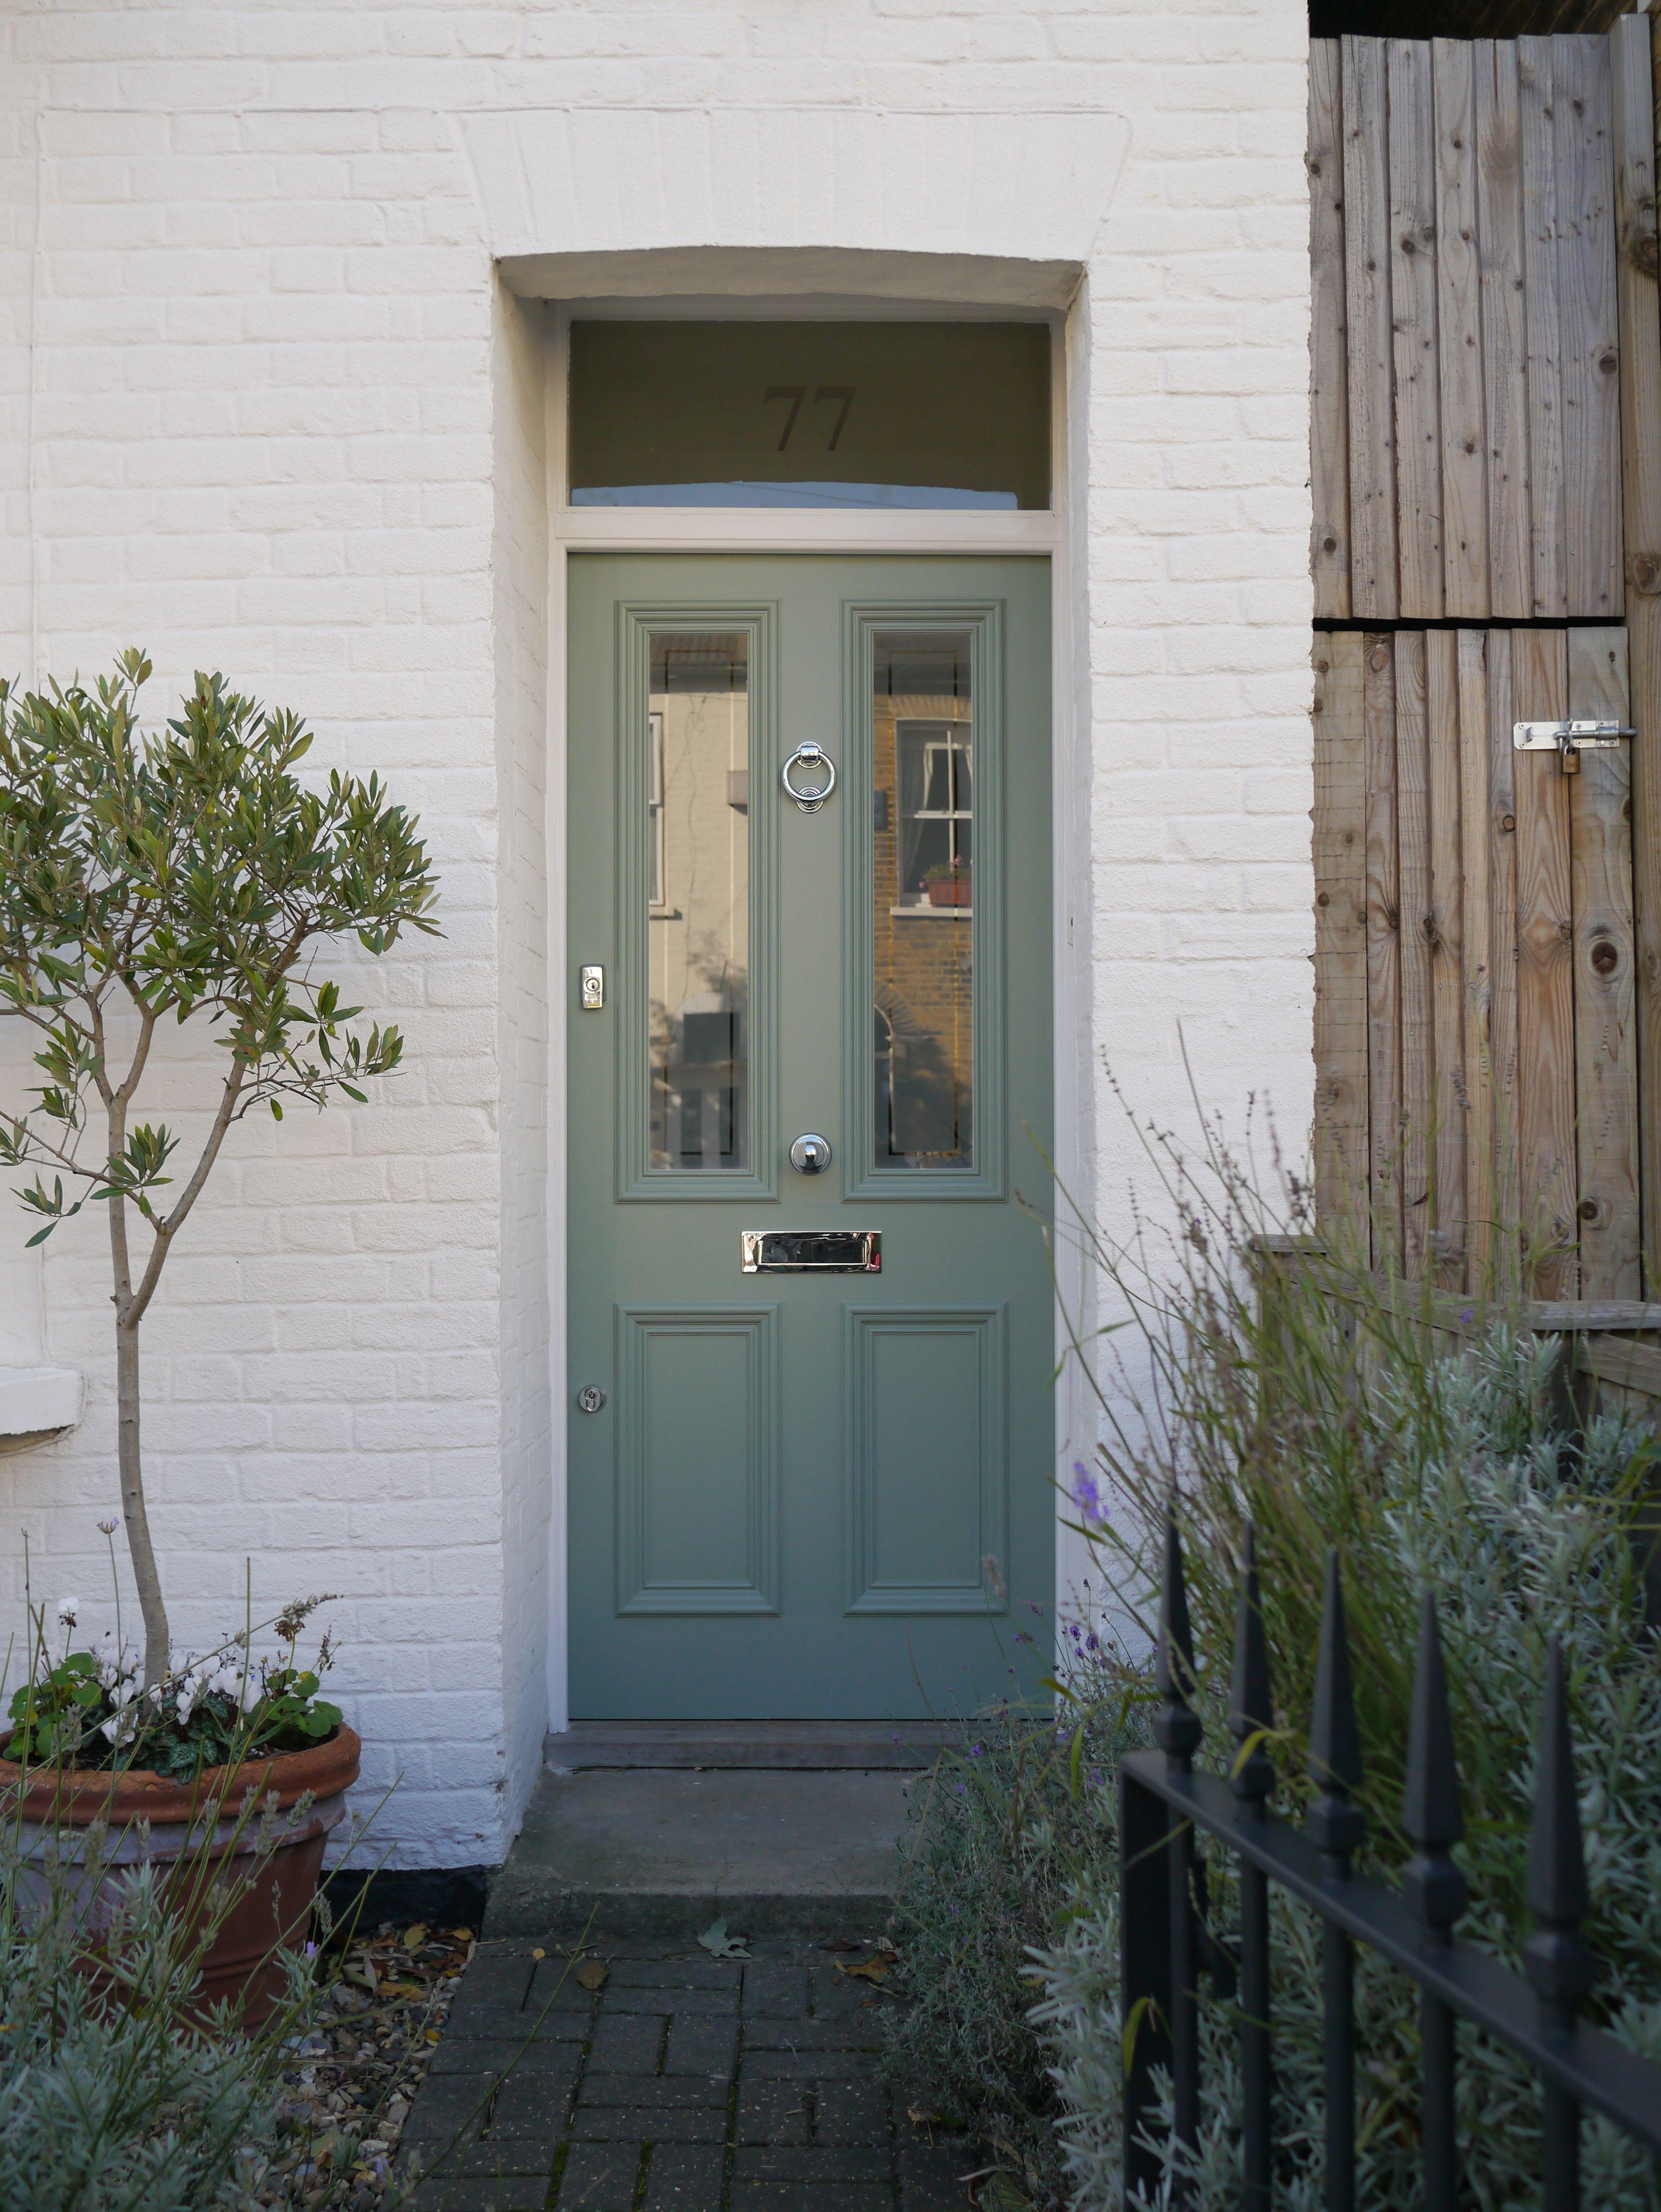 The london door company balham london farrow and ball - Farrow and ball exterior door paint ...